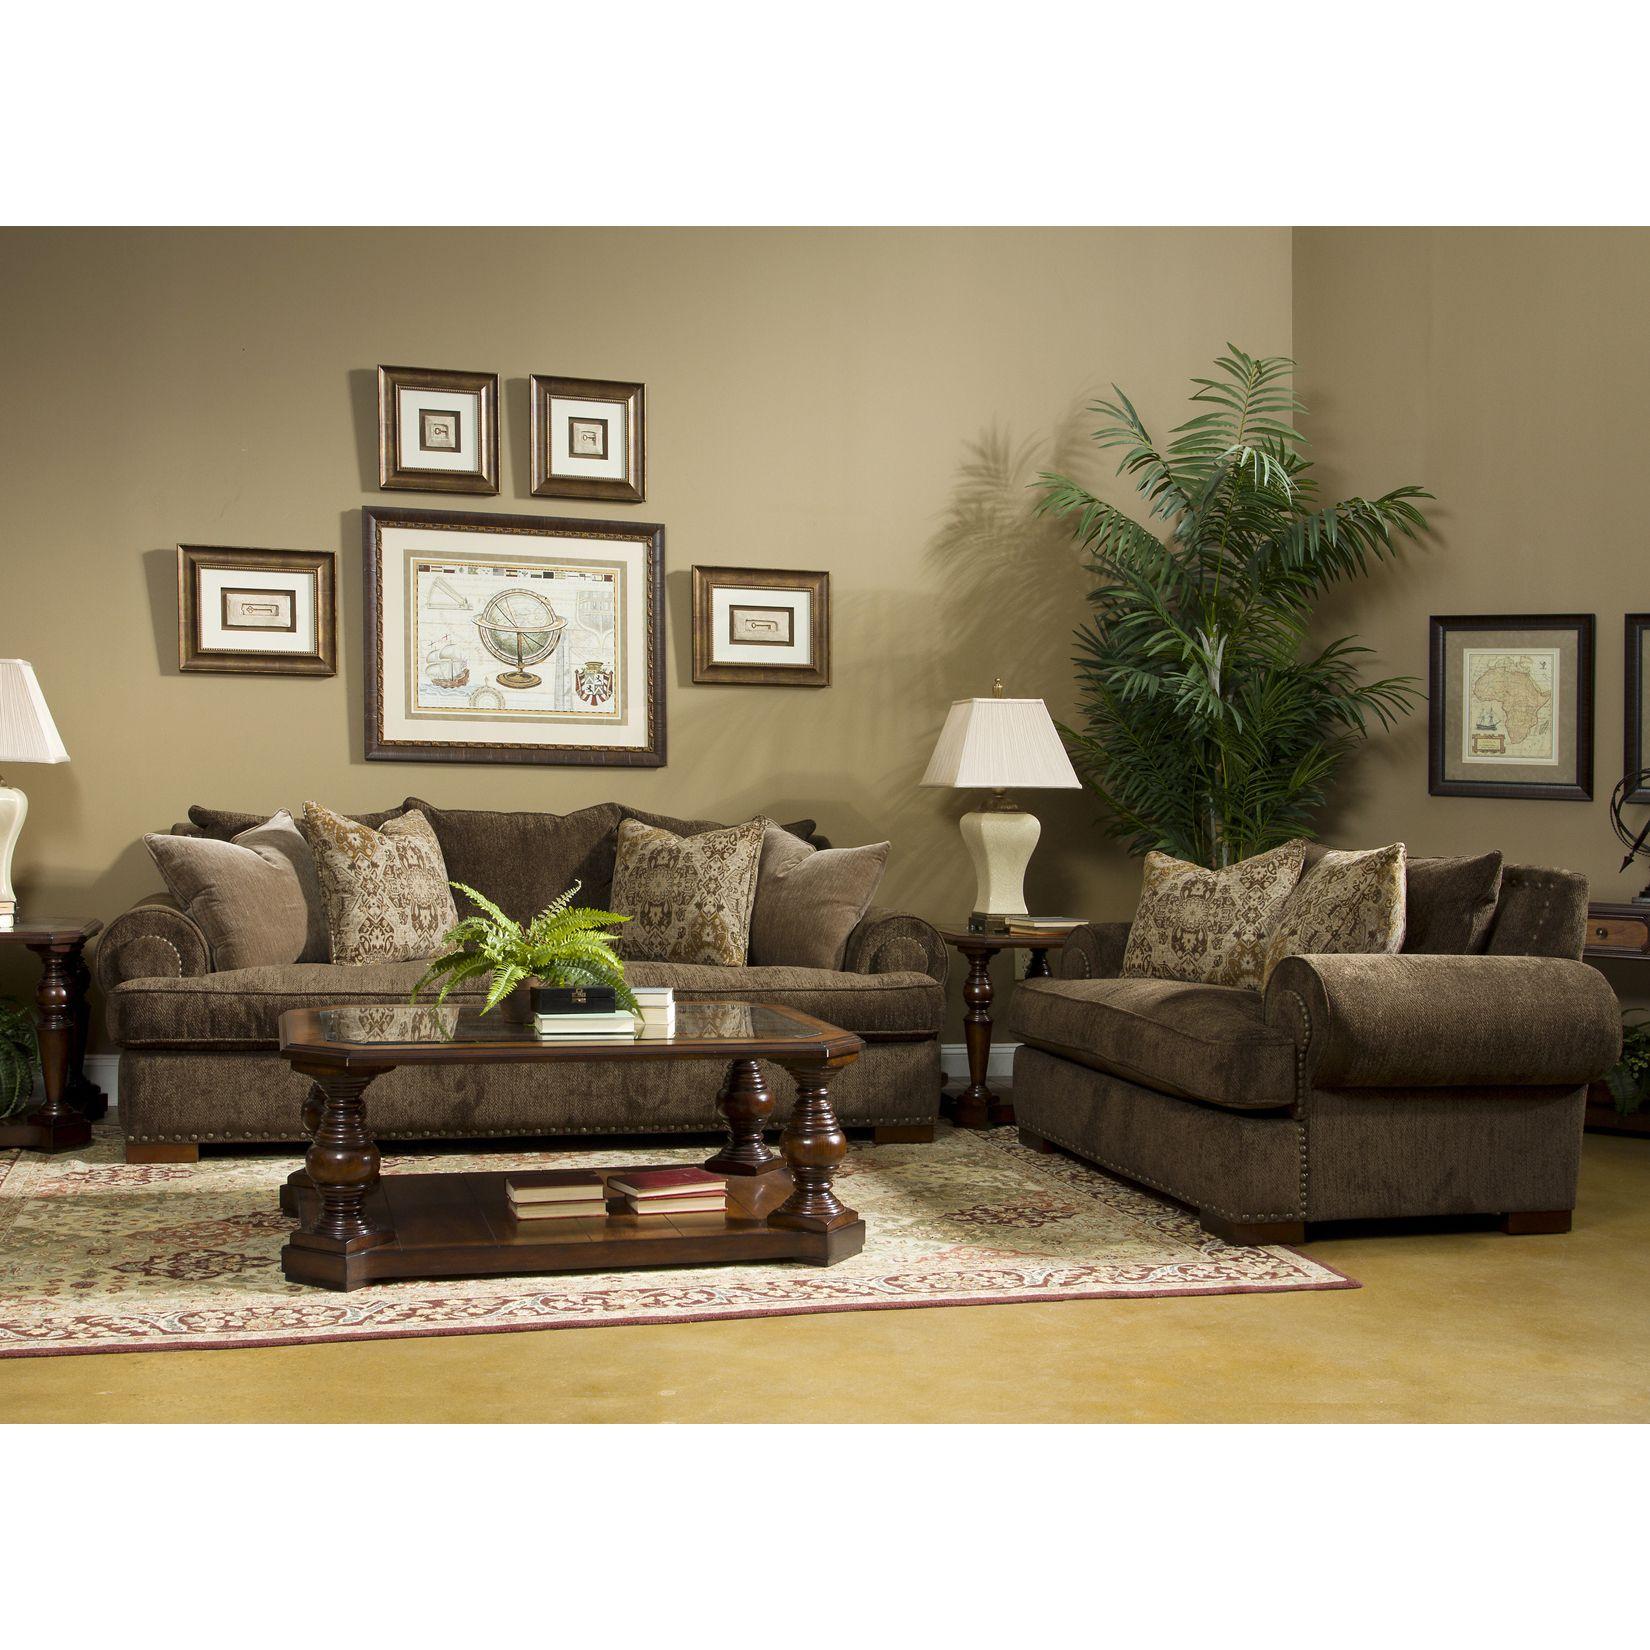 Fairmont designs made to order regency piece sofa set pc brown